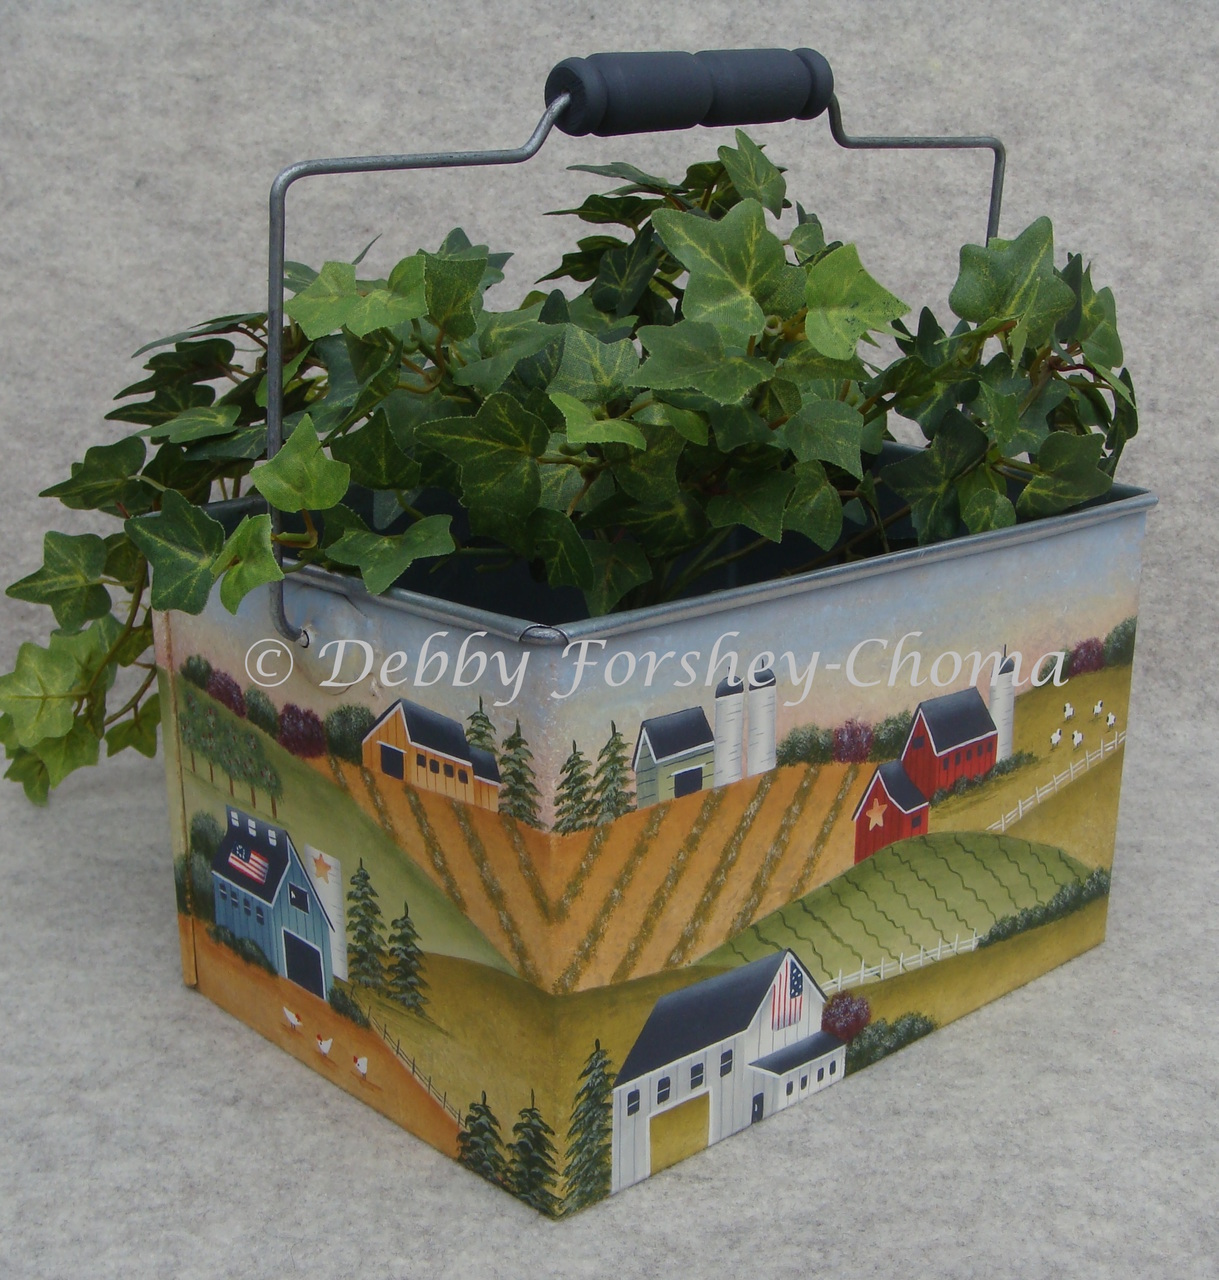 American Farmlands - E-Packet - Debby Forshey-Choma